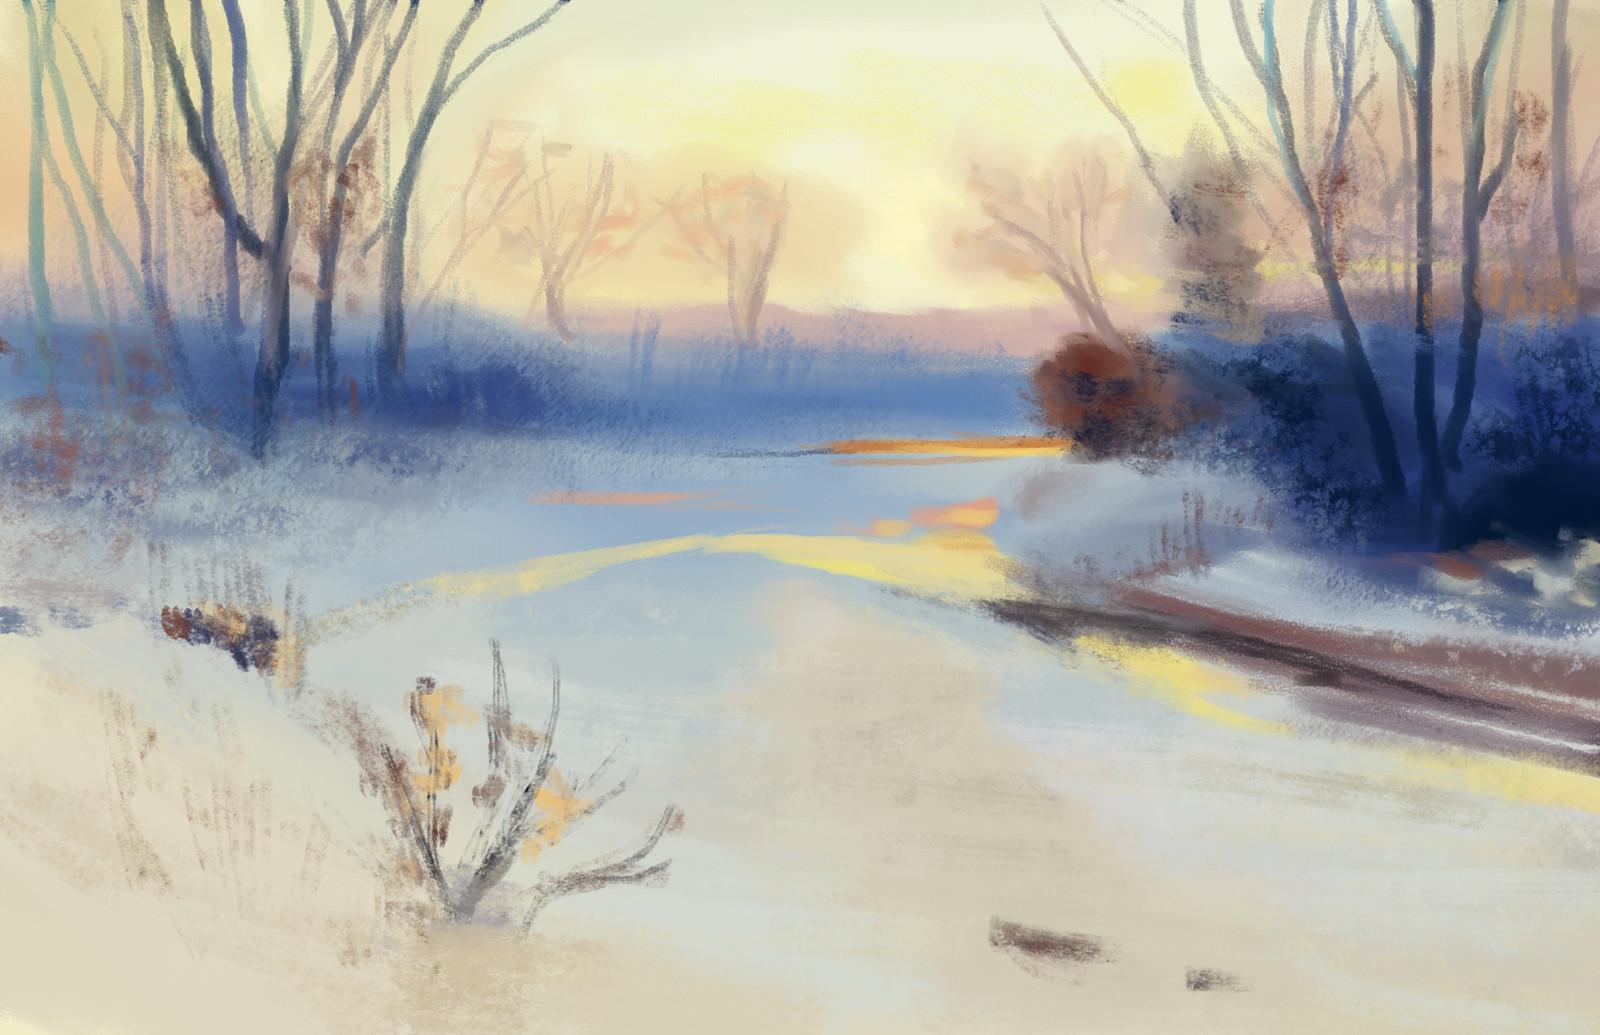 Charles Partridge Adams: Snowy Sunset - Study